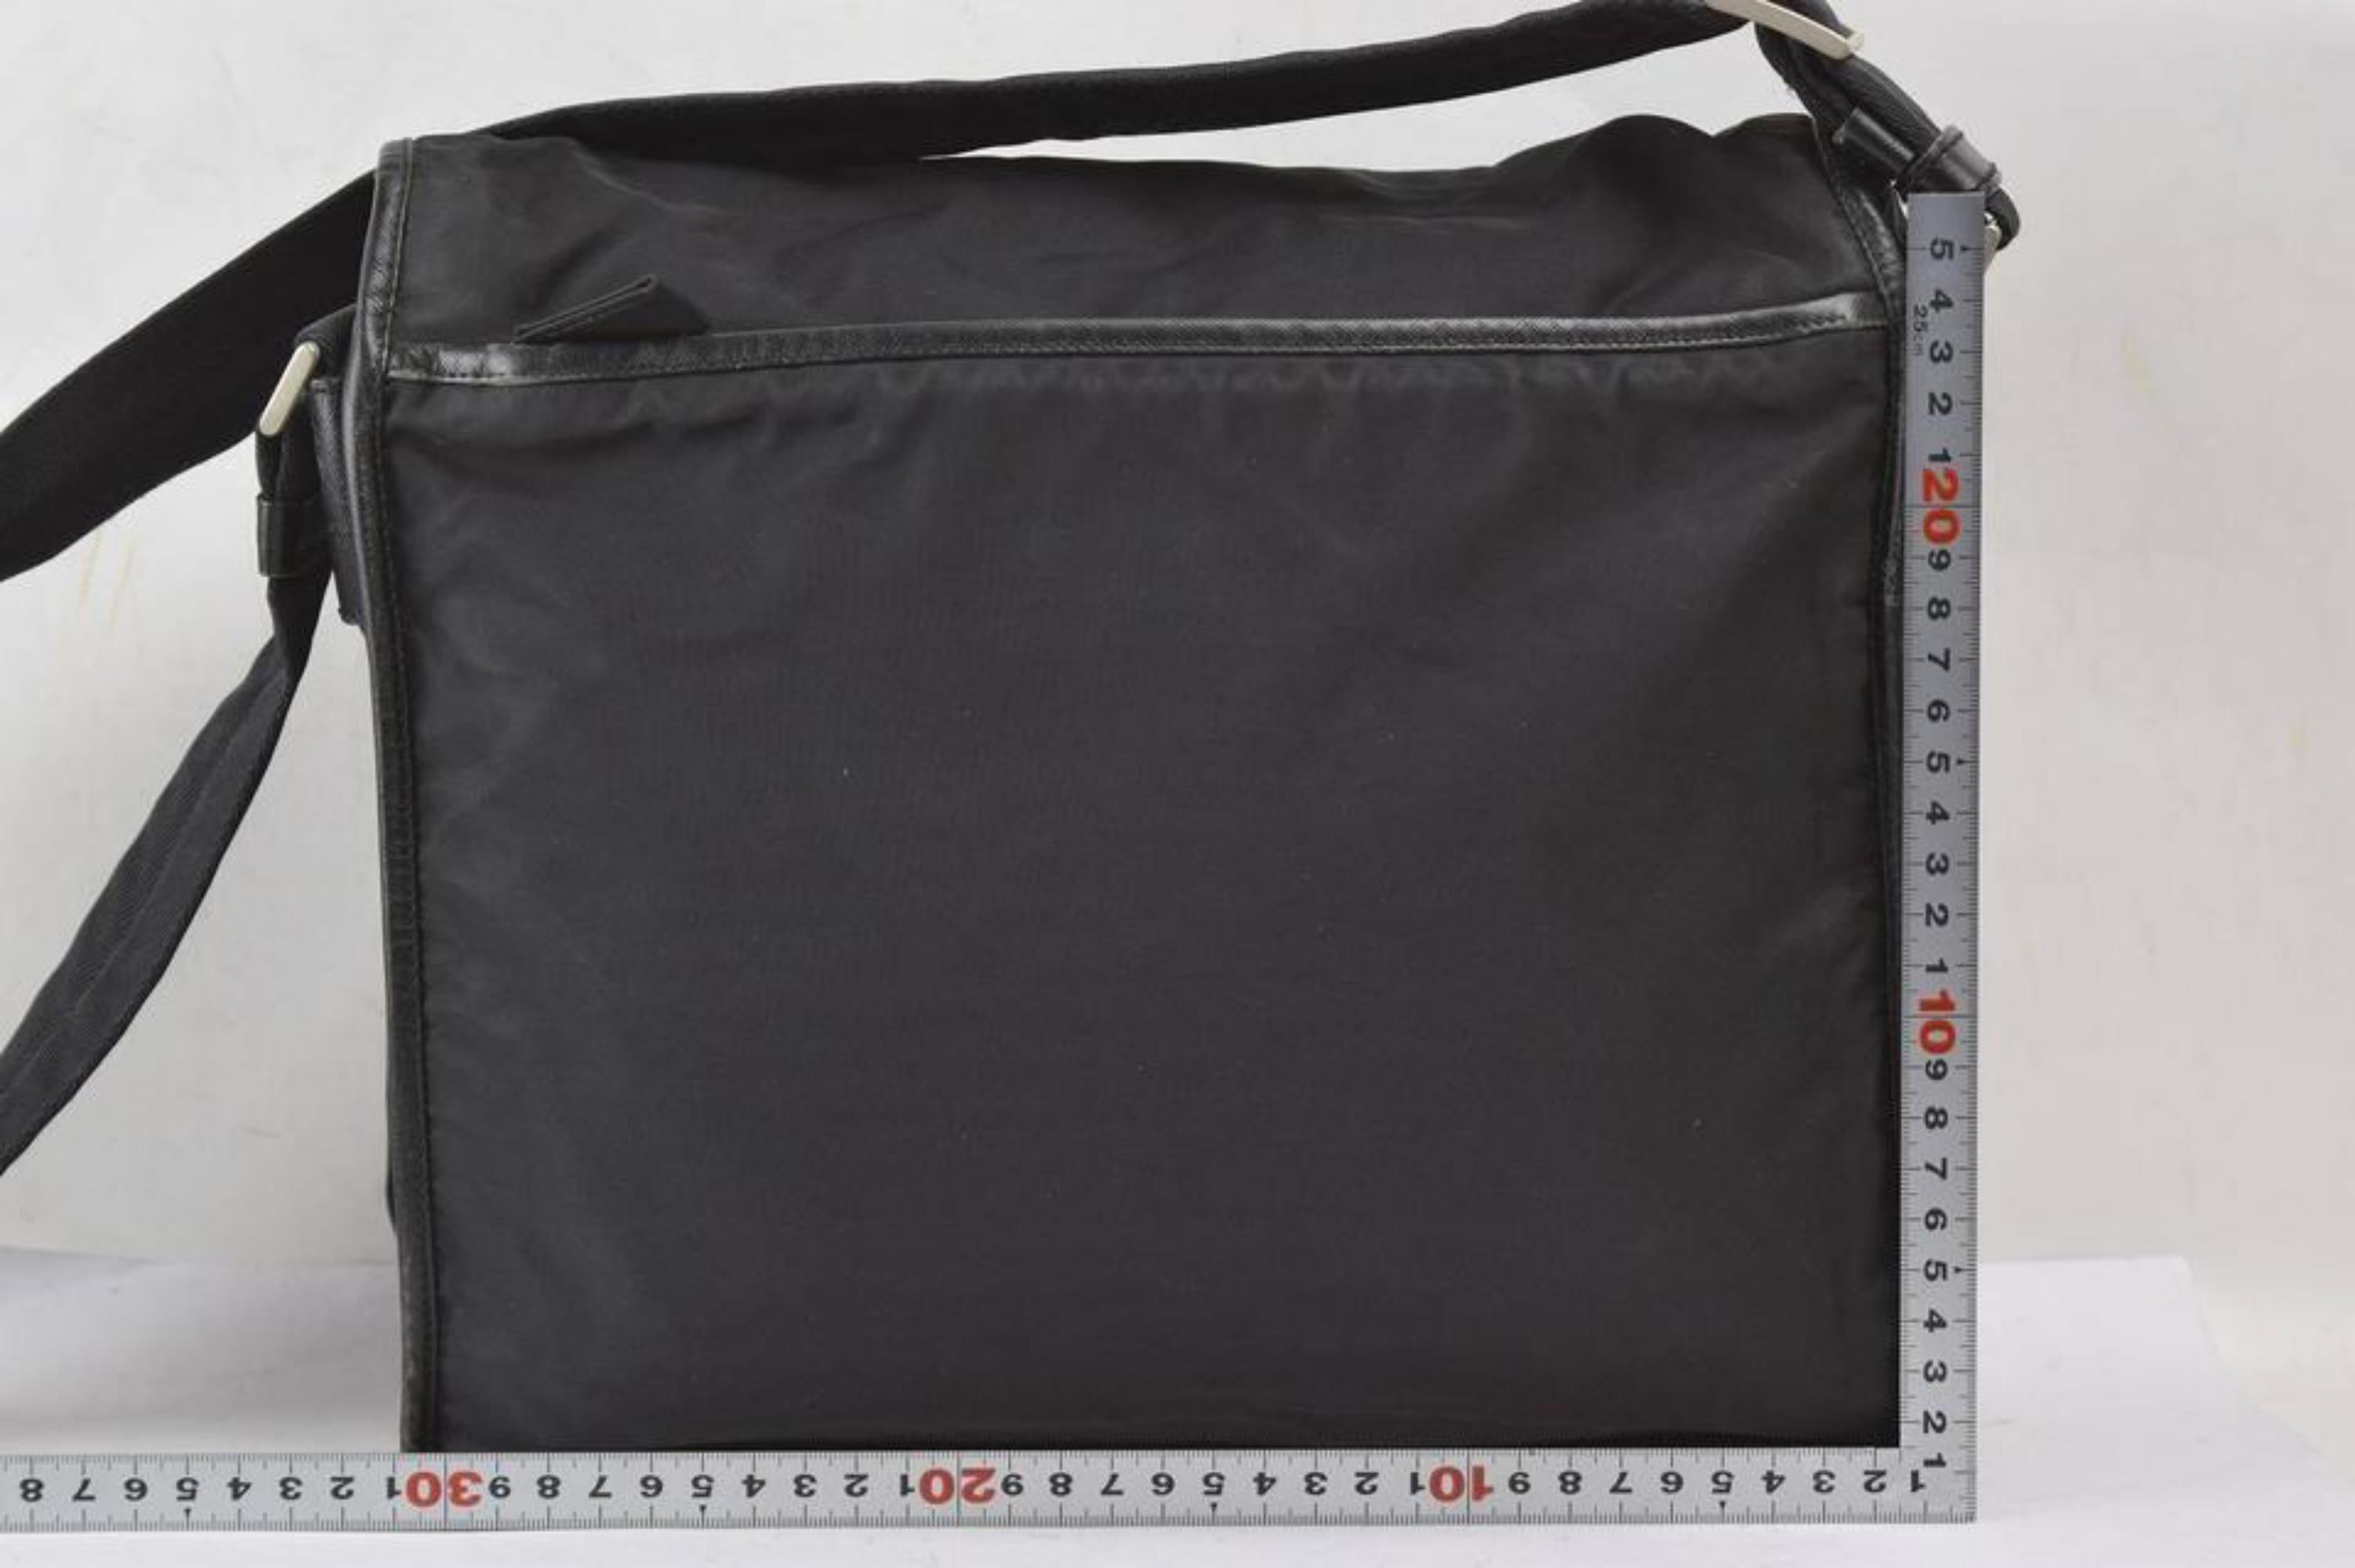 c9a0e7c0aadd6c Prada Crossbody Messenger 867319 Black Nylon Laptop Bag For Sale at 1stdibs